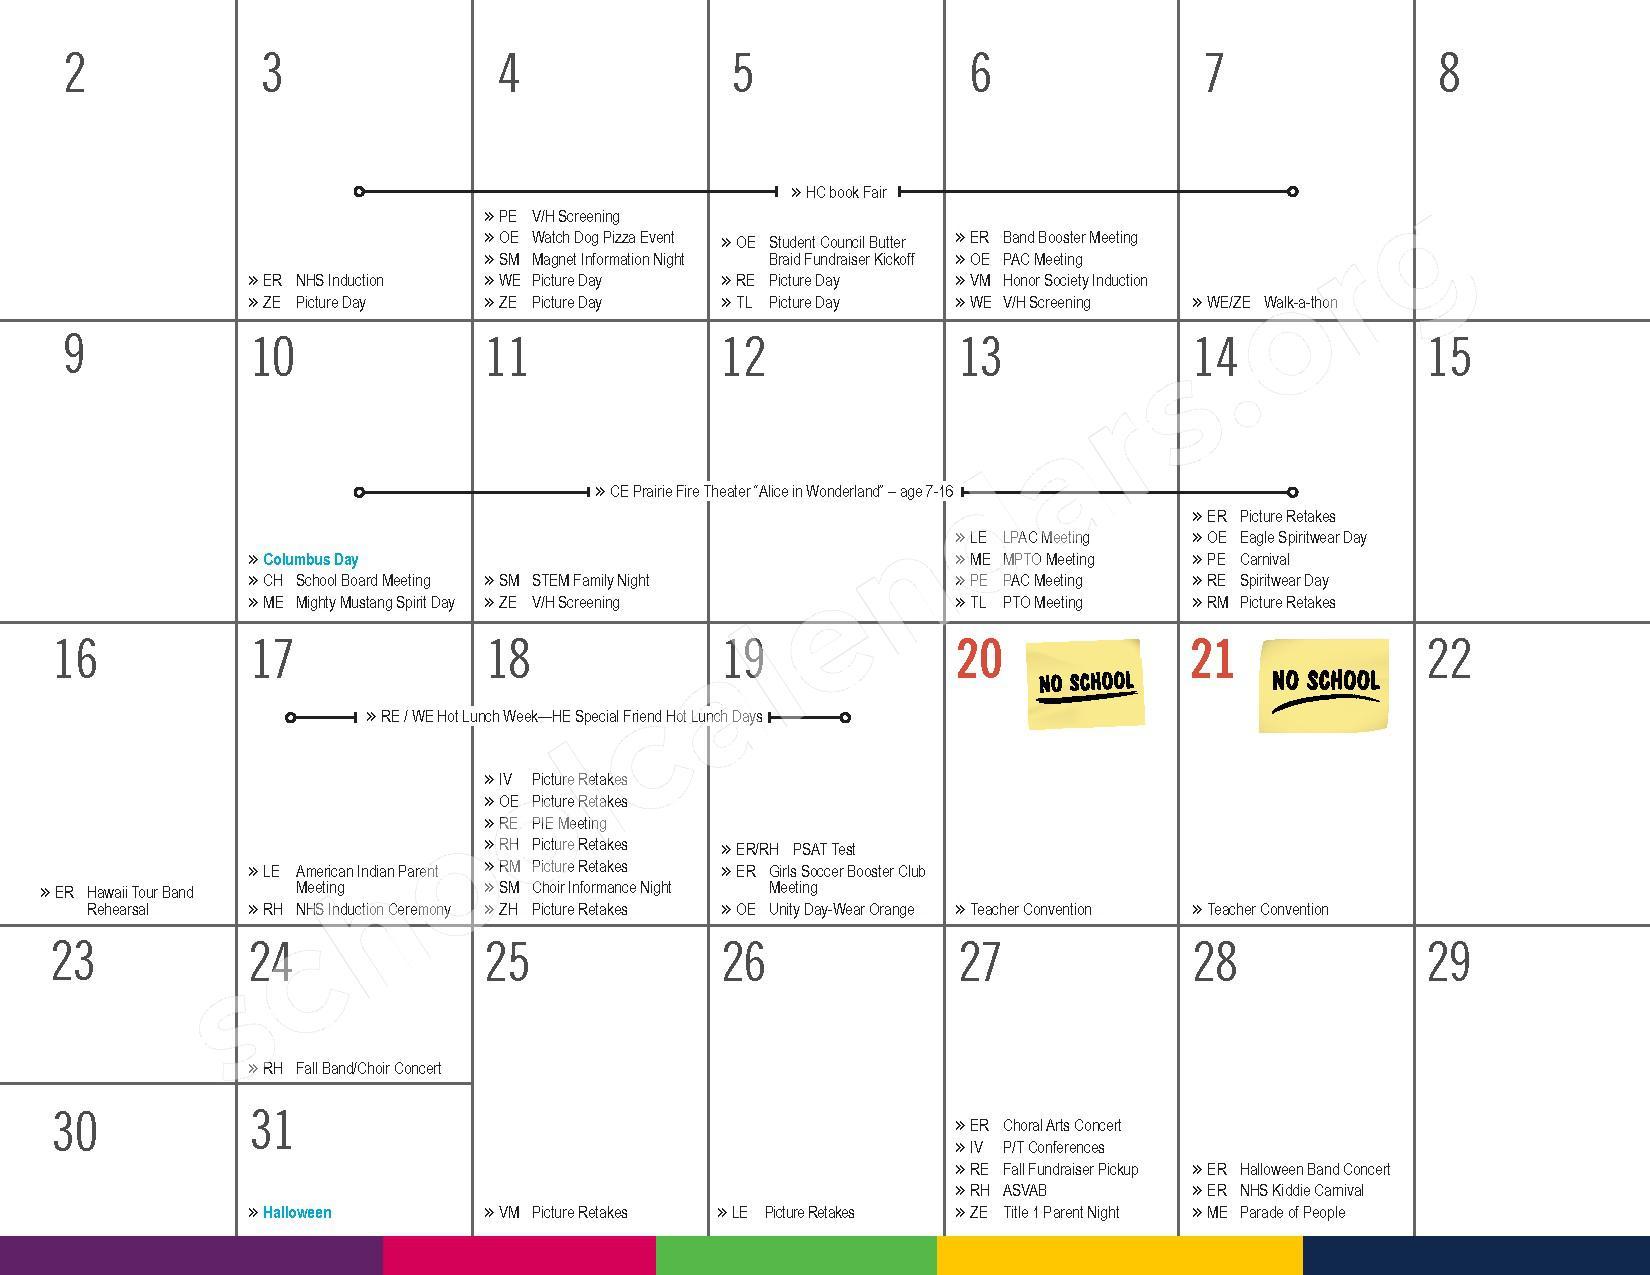 2016 - 2017 District Calendar – Vandenberge Middle School – page 9